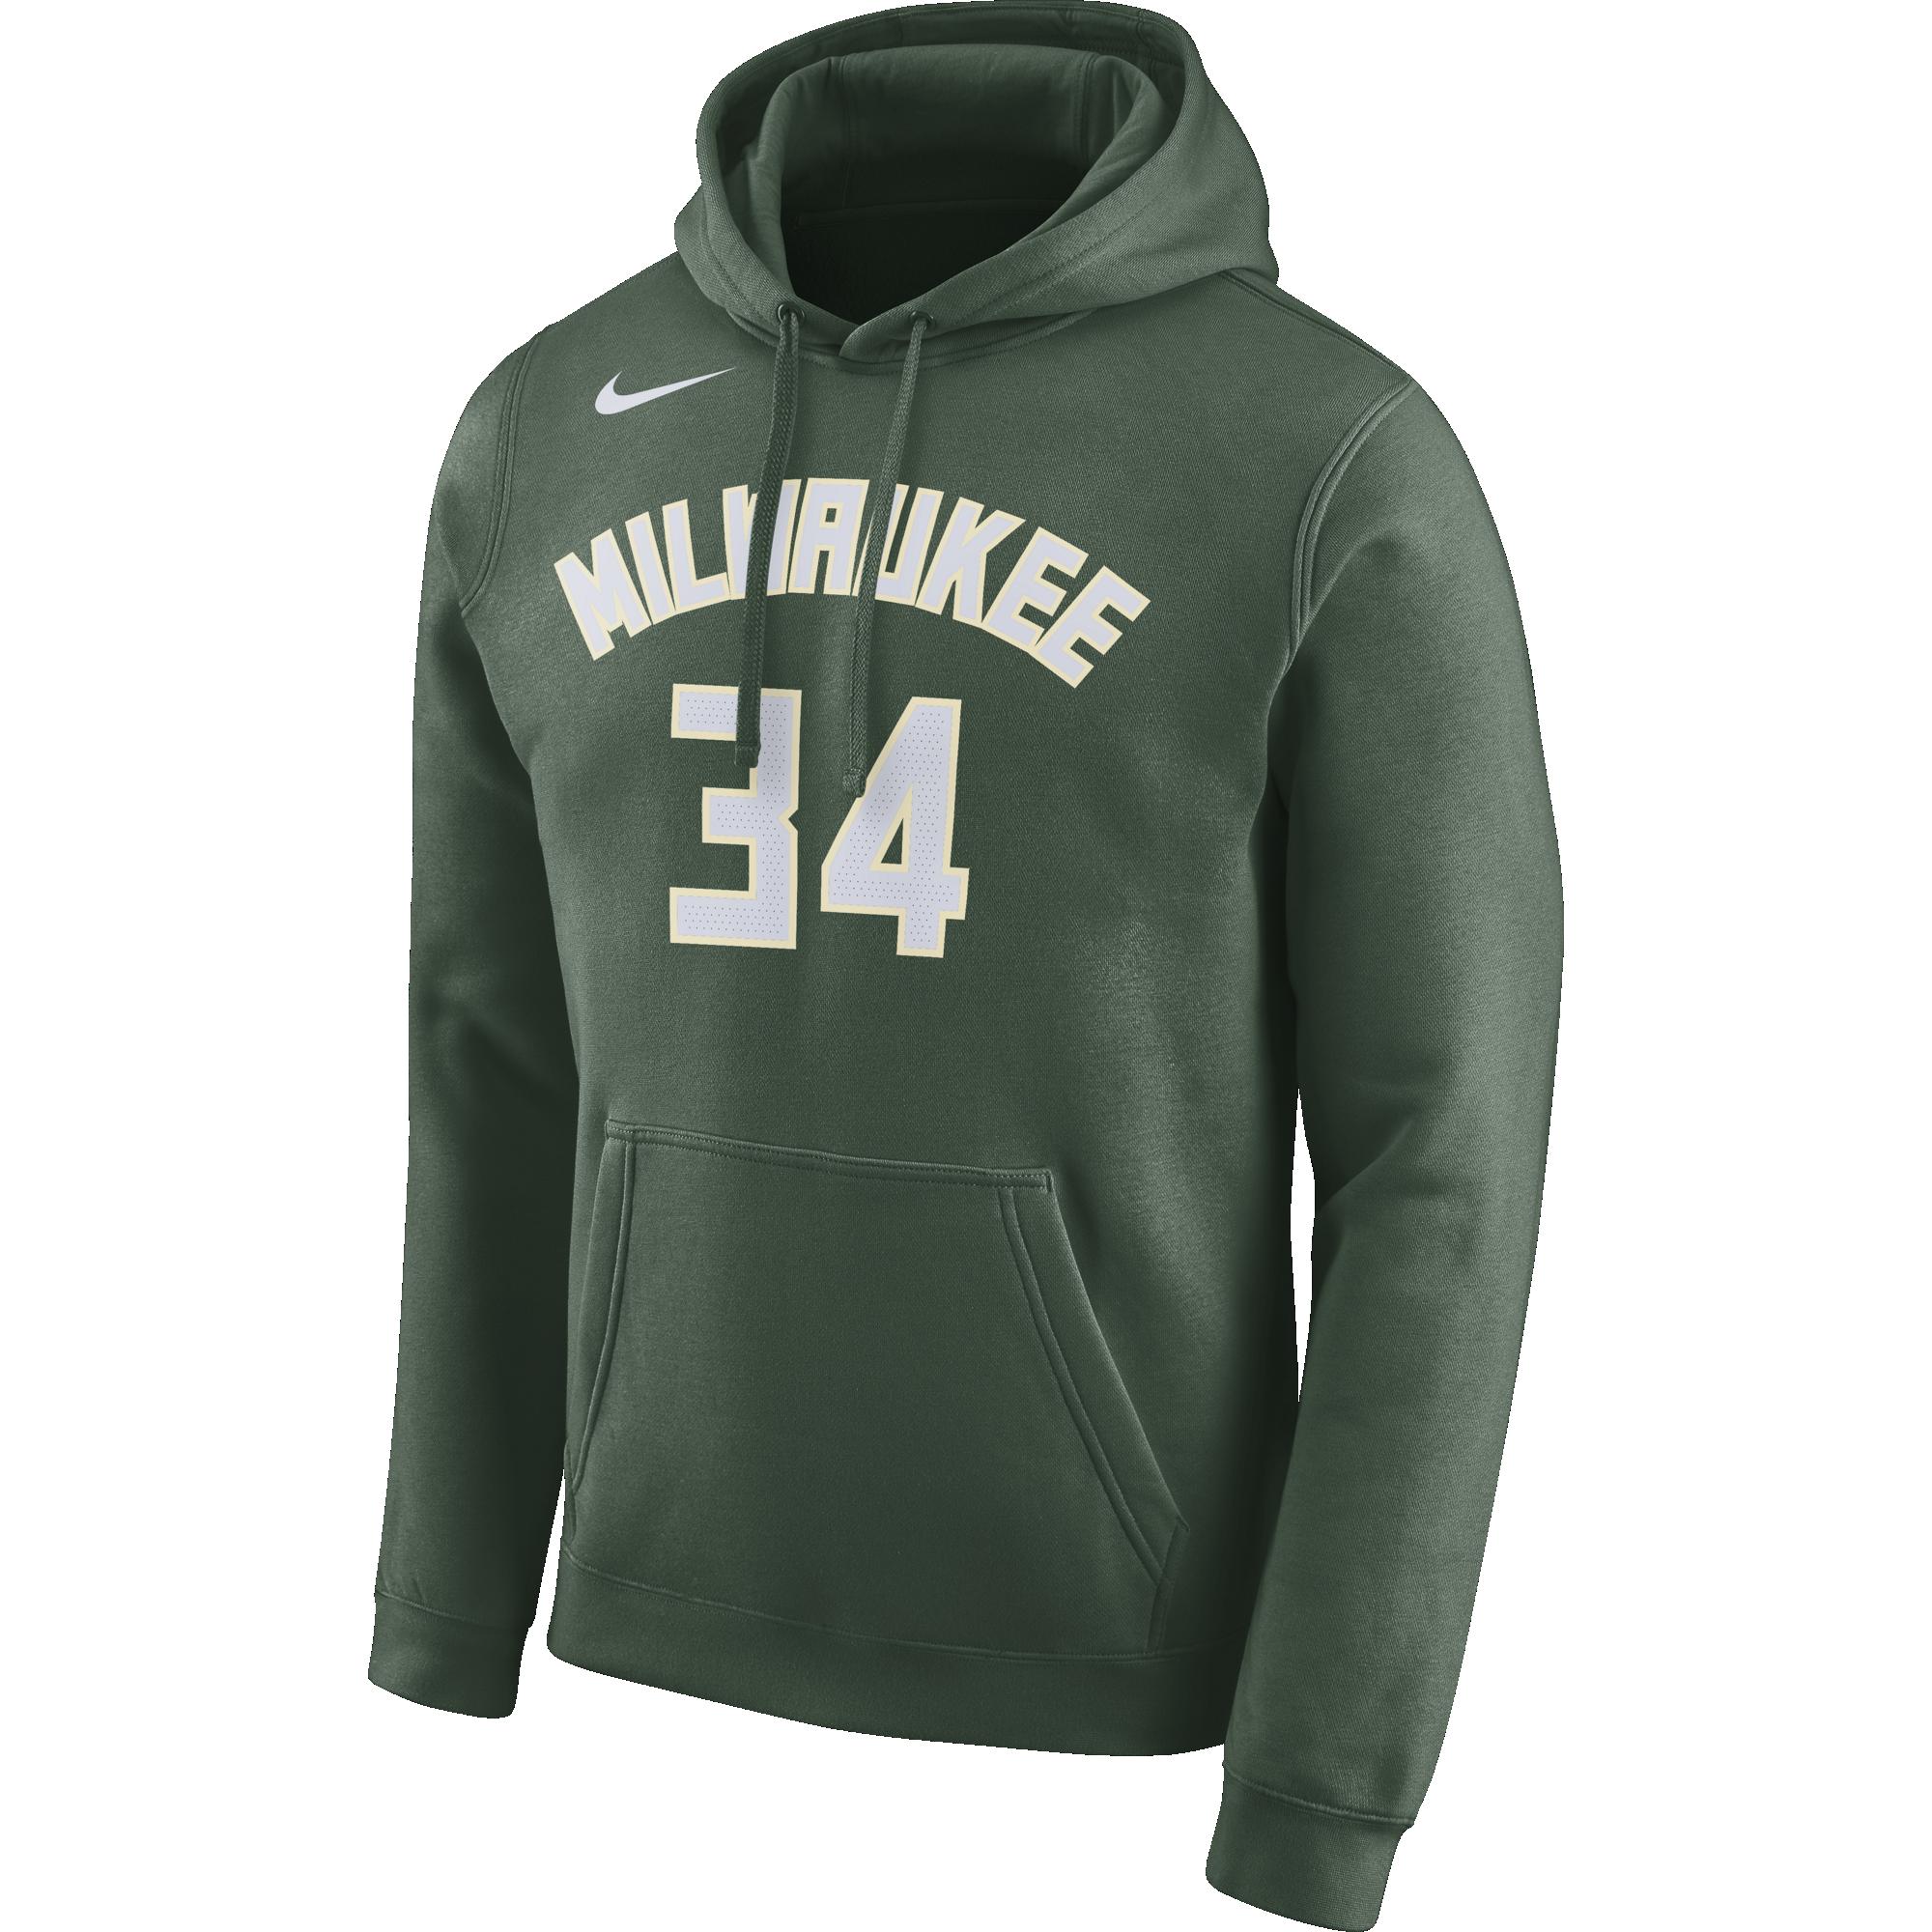 73e35958 NIKE NBA MILWAUKEE BUCKS GIANNIS ANTETOKOUNMPO HOODIE for £60.00 |  kicksmaniac.com | kicksmaniac.com